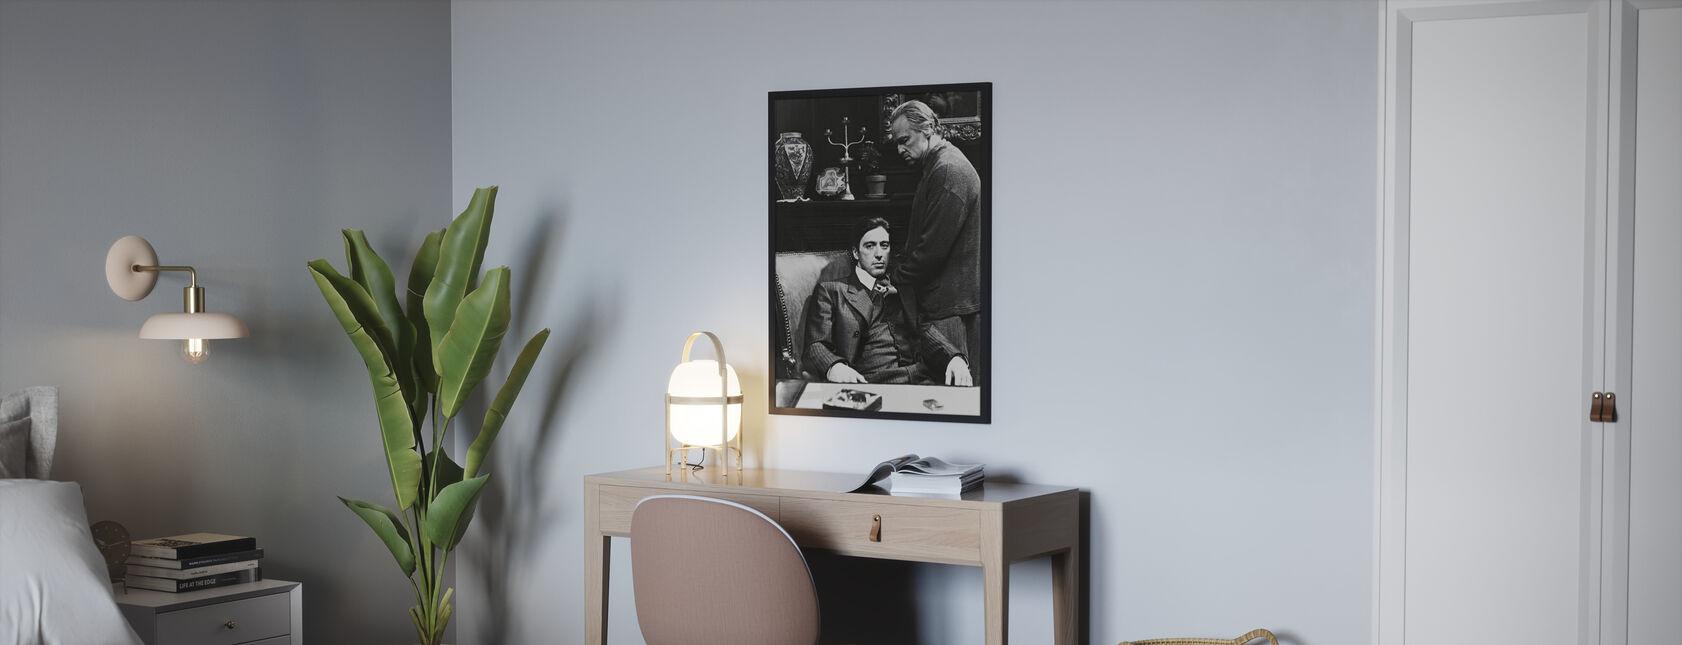 Gudfaren - Al Pacino og Marlon Brando - Plakat - Soverom